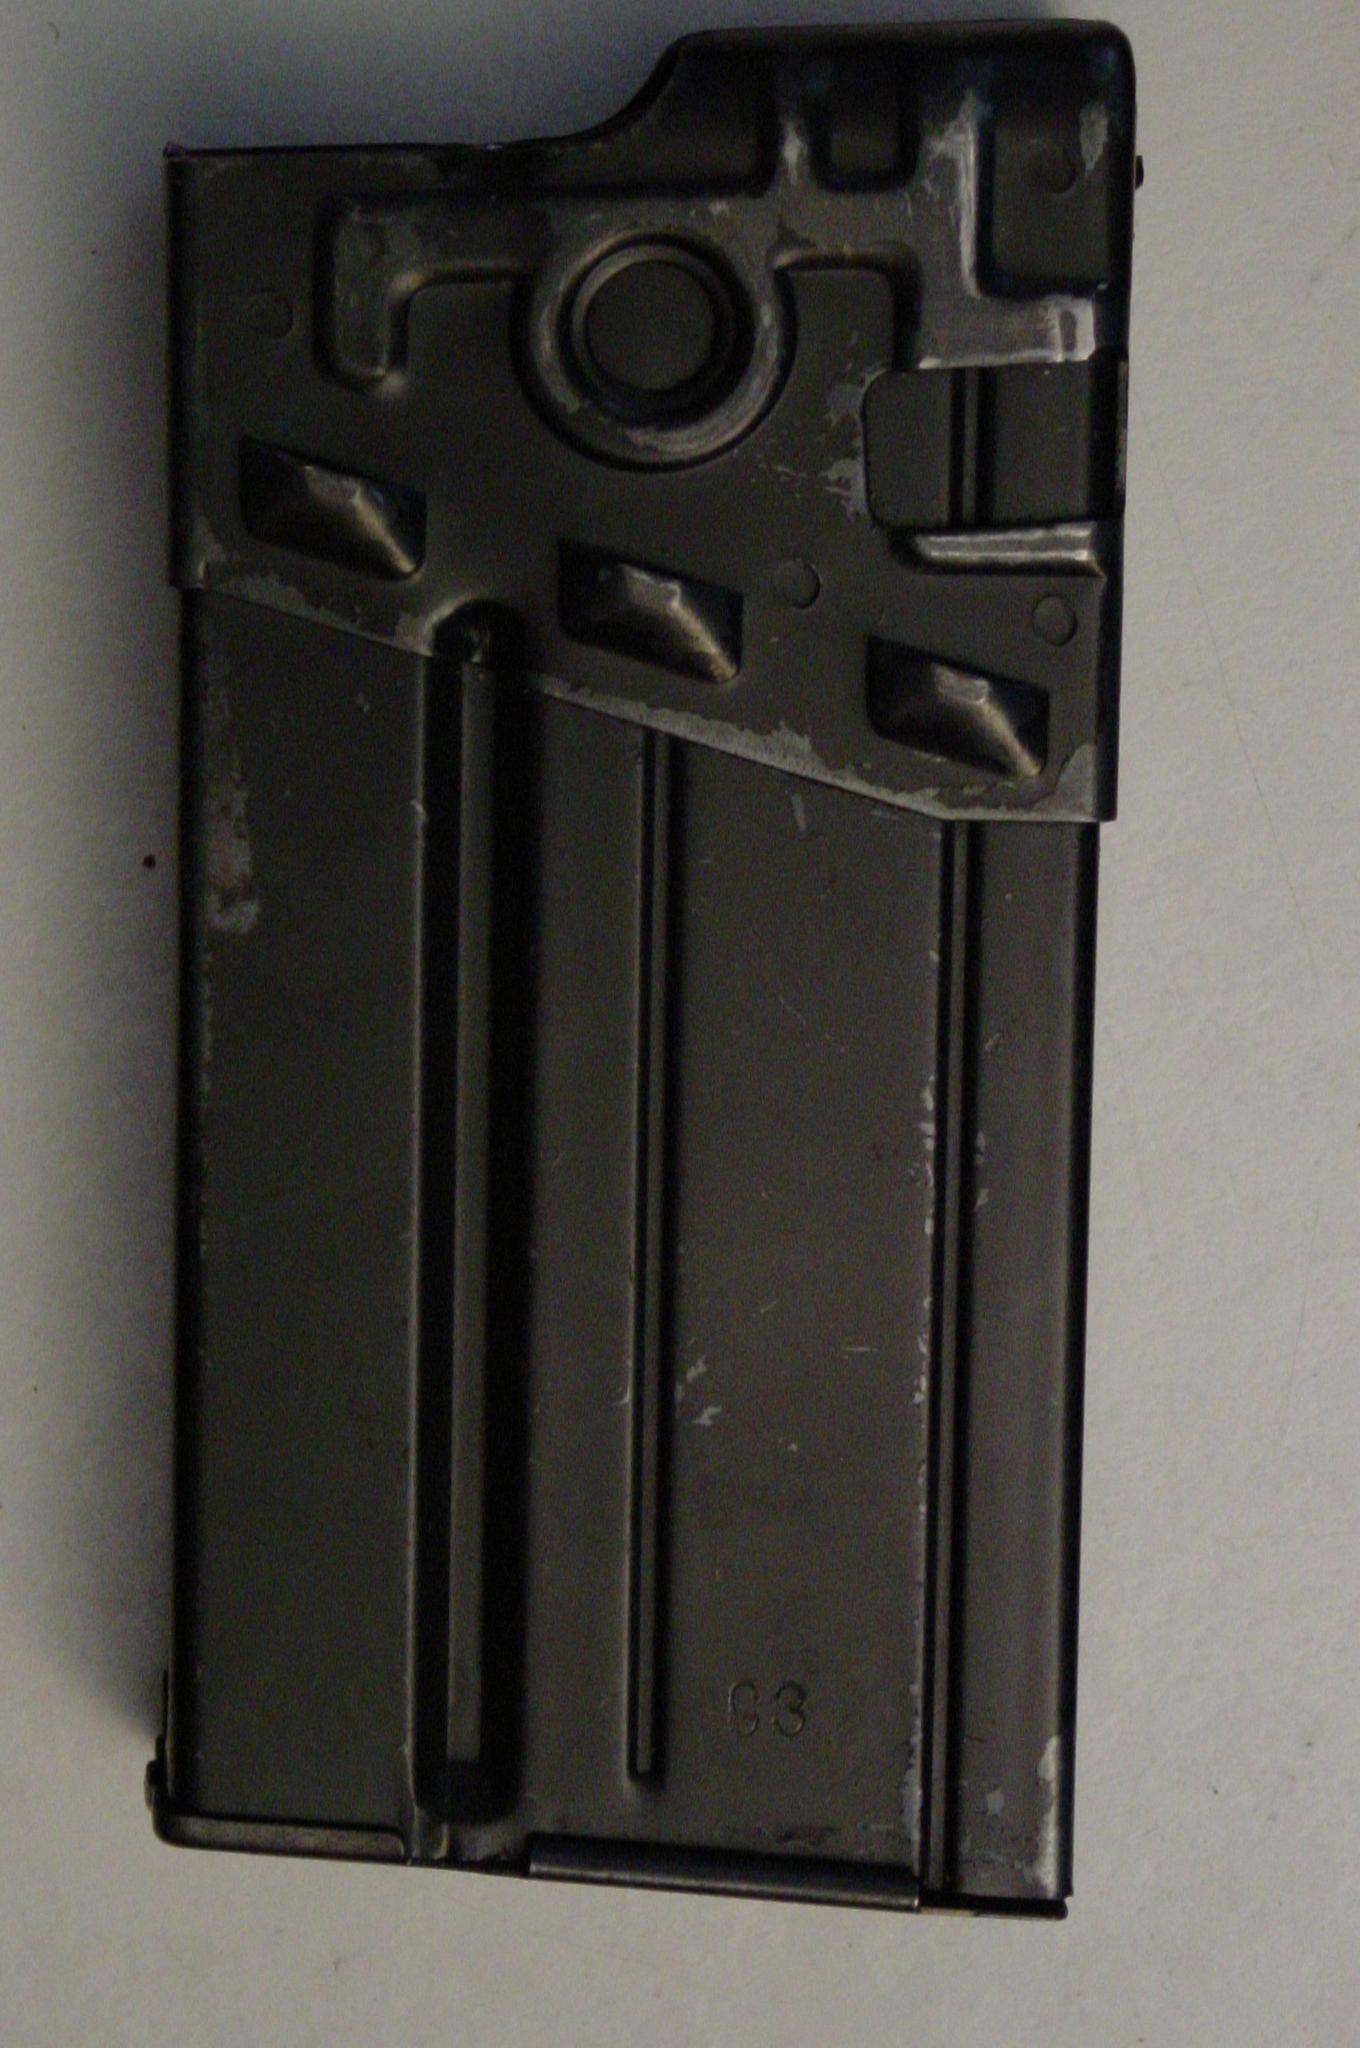 G3 Identification-dsc05430.jpg